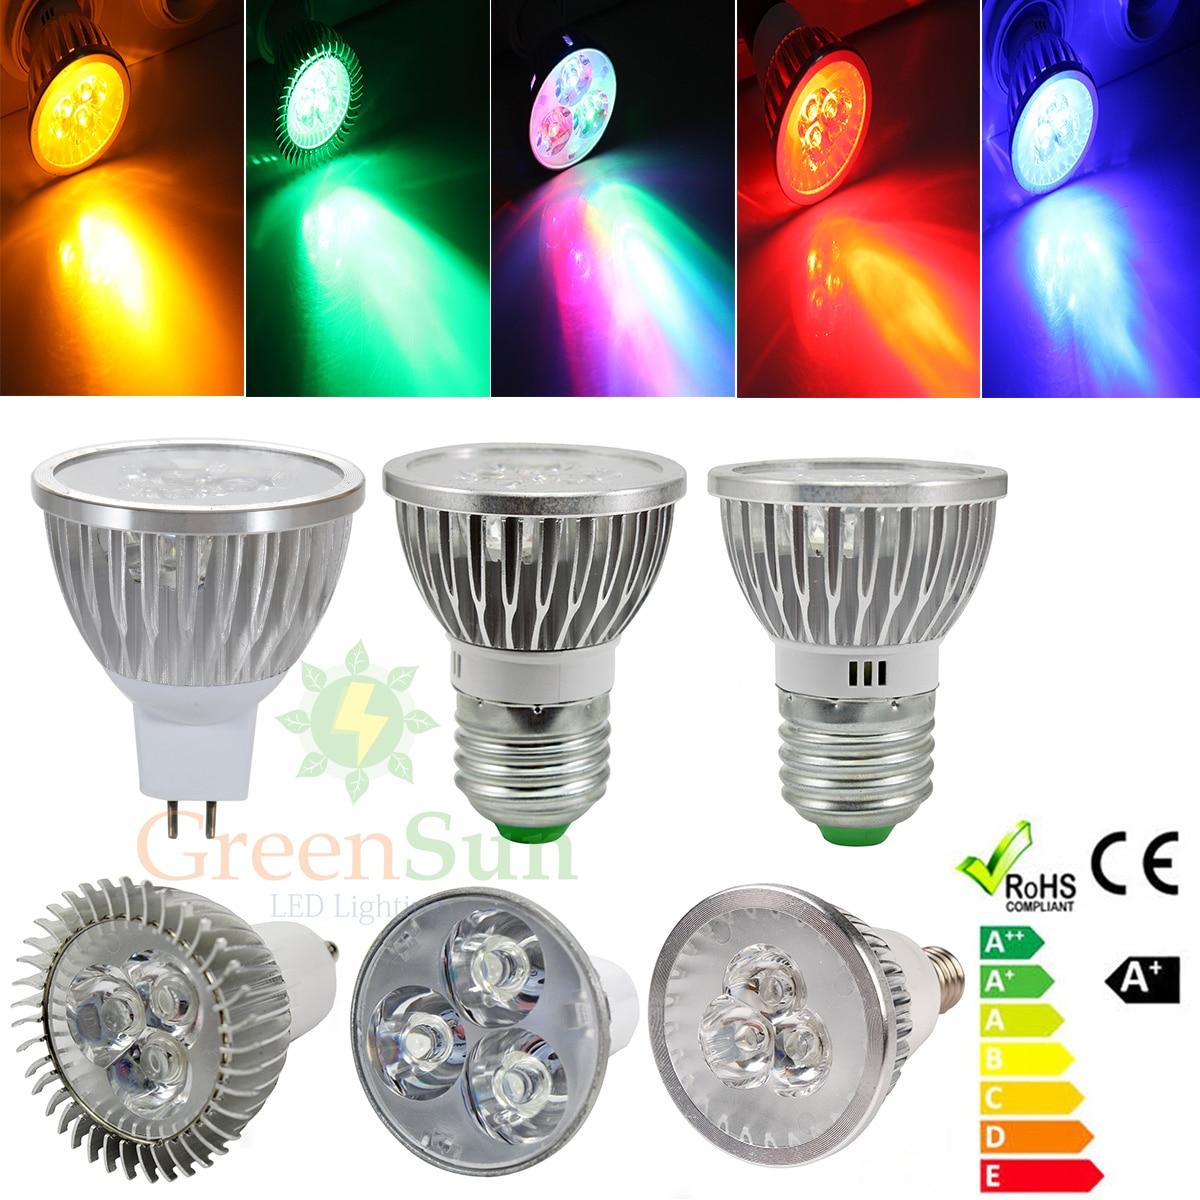 Gu10 Mr16 E14 E27 3w Led Energy Saving Spotlight Light Lamp Xmas Bulb Party Bar Ktv Decorative Light Bulbs